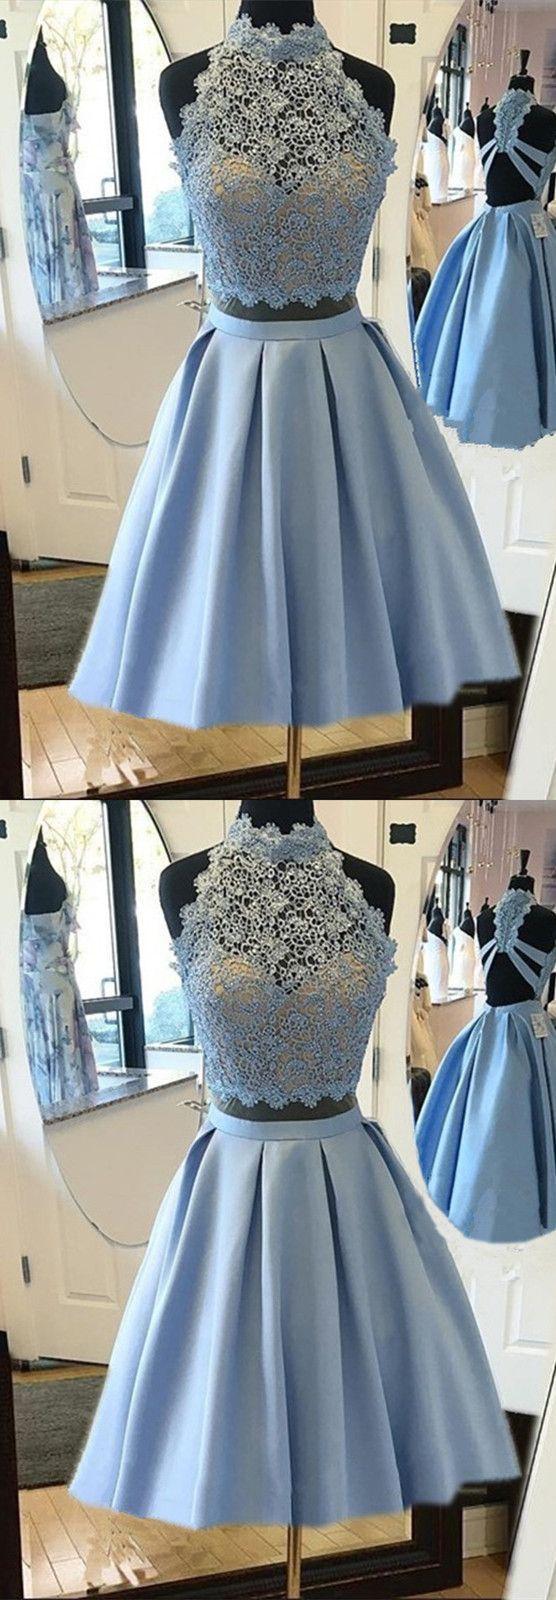 Elegant Light Blue Homecoming Dresses Lace Crop Top Prom Dresses Two Piece Shortpromdress Prom Dresses Blue Blue Homecoming Dresses Two Piece Homecoming Dress [ 1600 x 556 Pixel ]